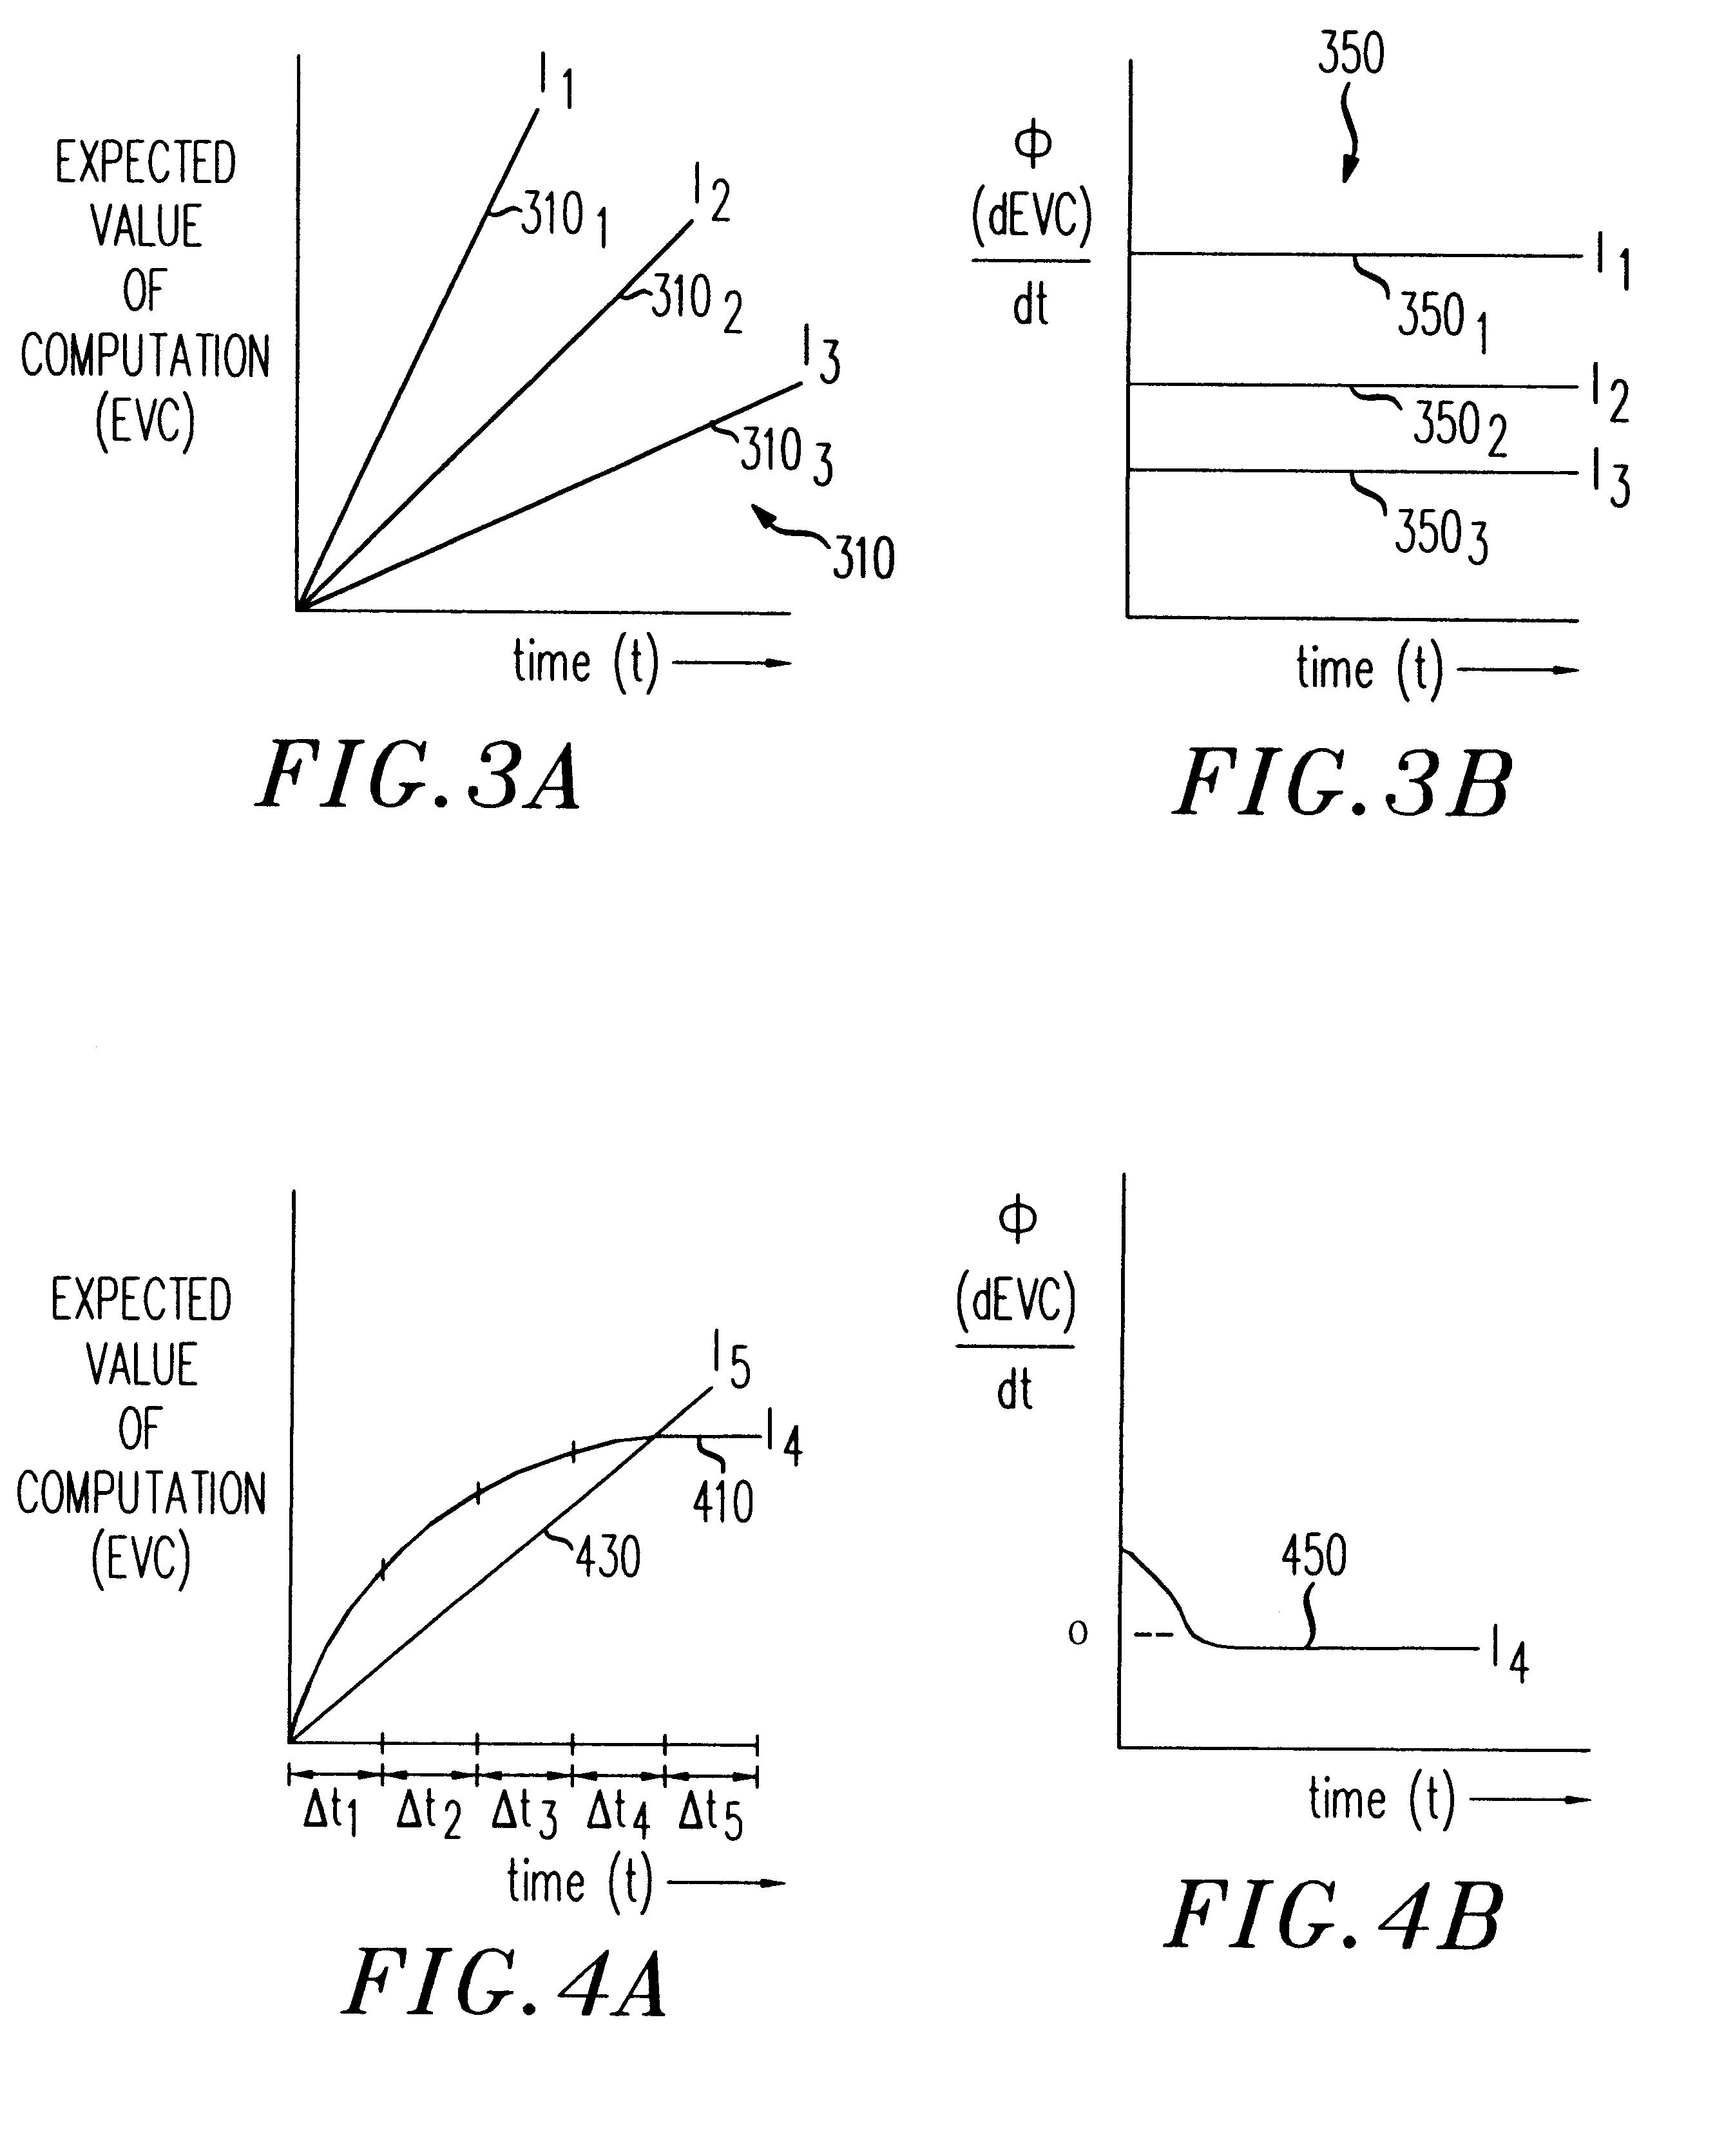 Patent US 6,182,133 B1